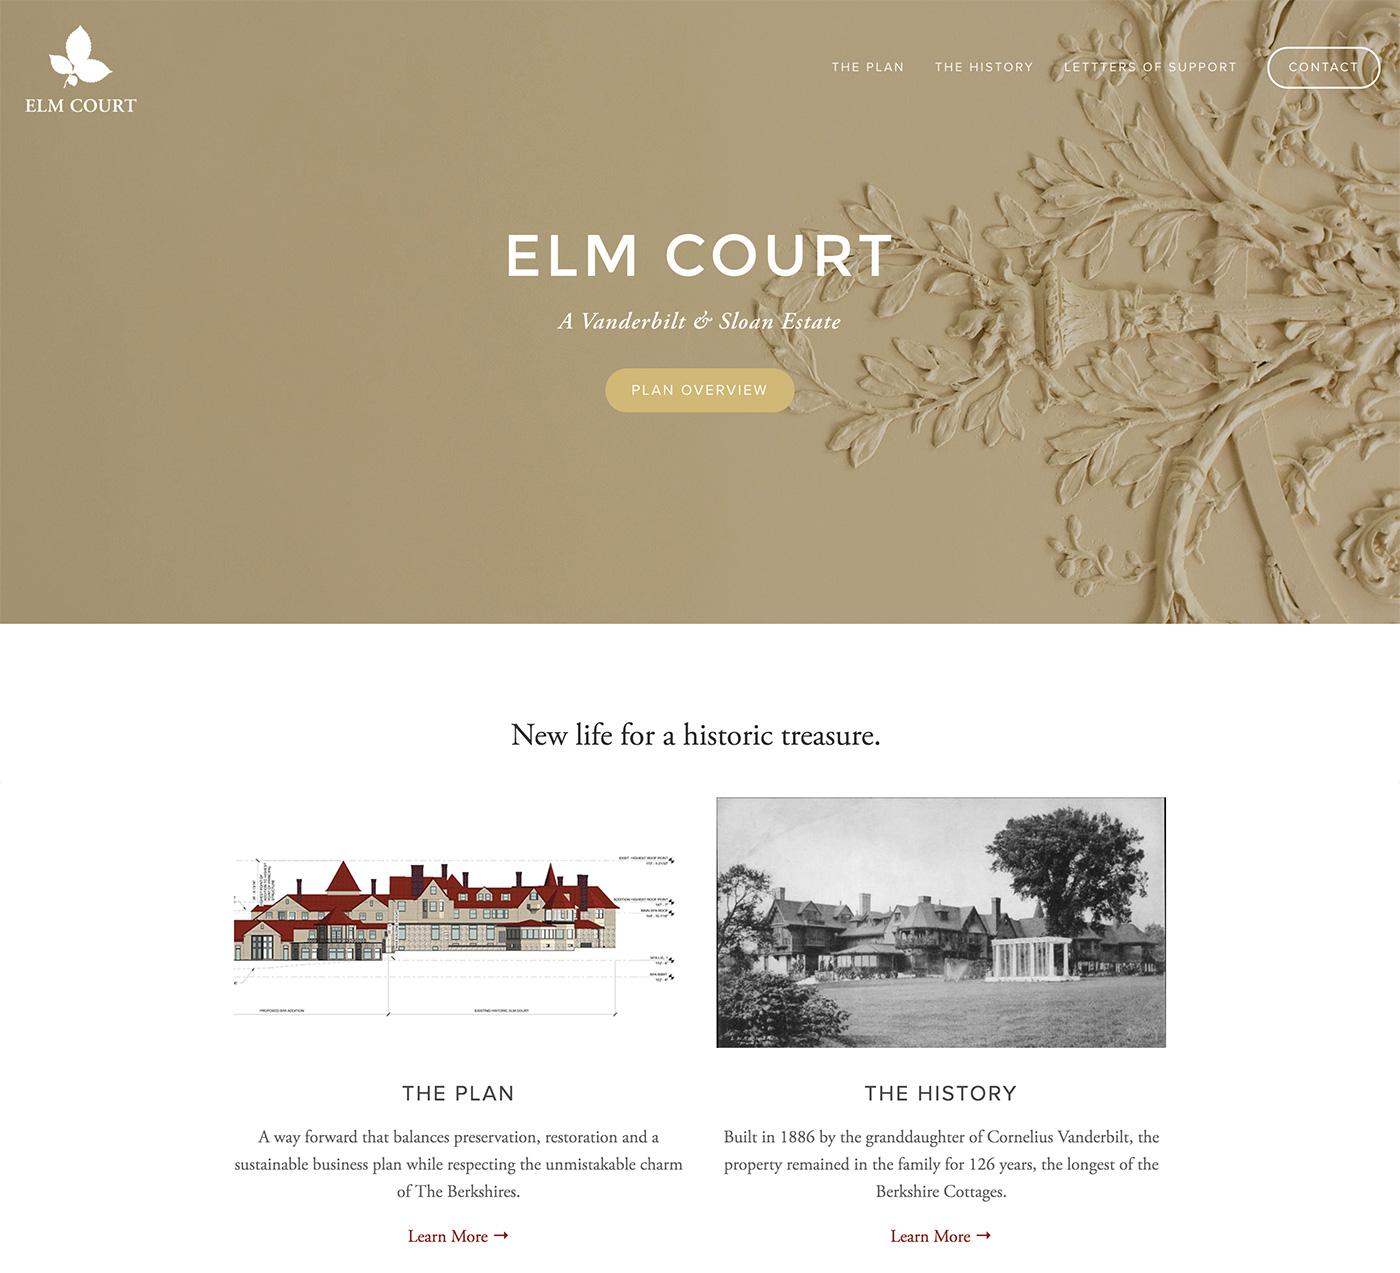 elm-court-top.jpg